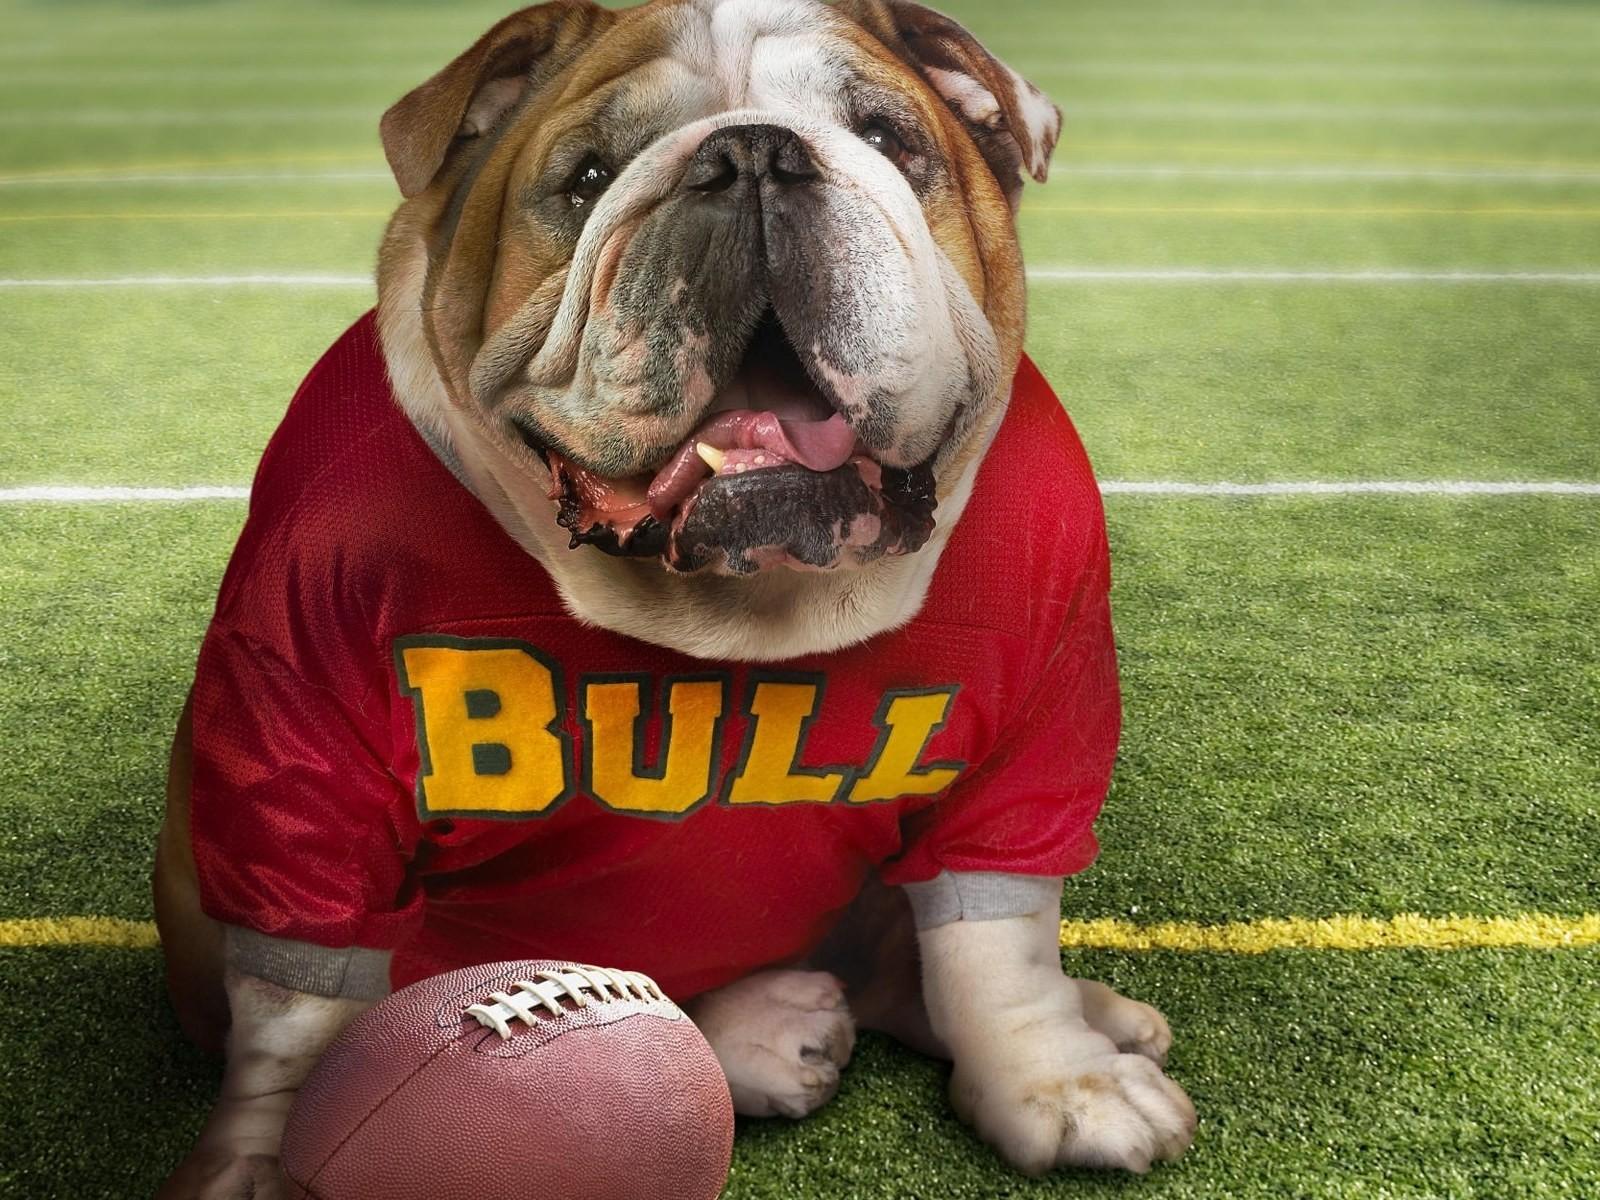 bull-le-chien-sportif